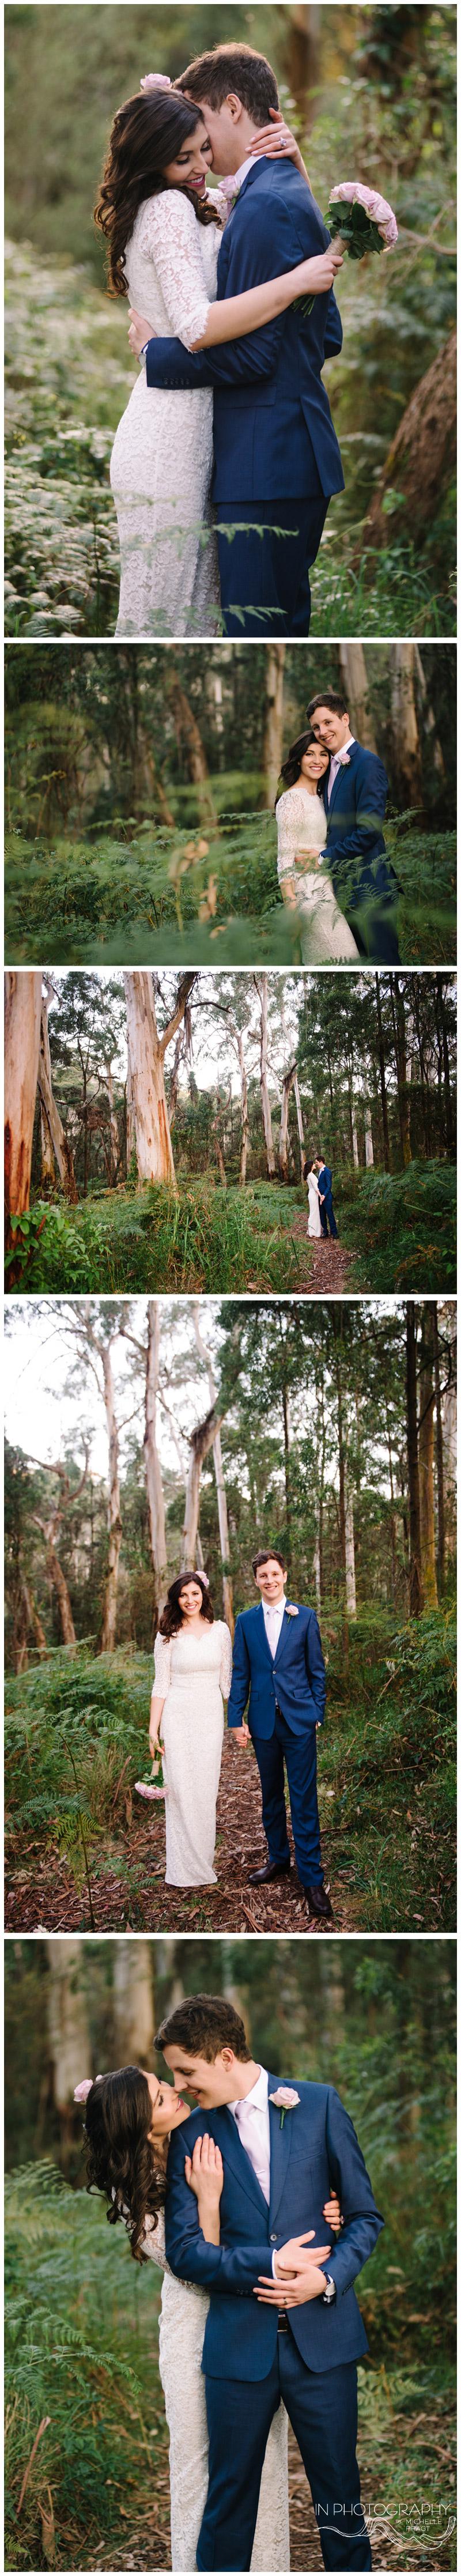 Red Hill wedding